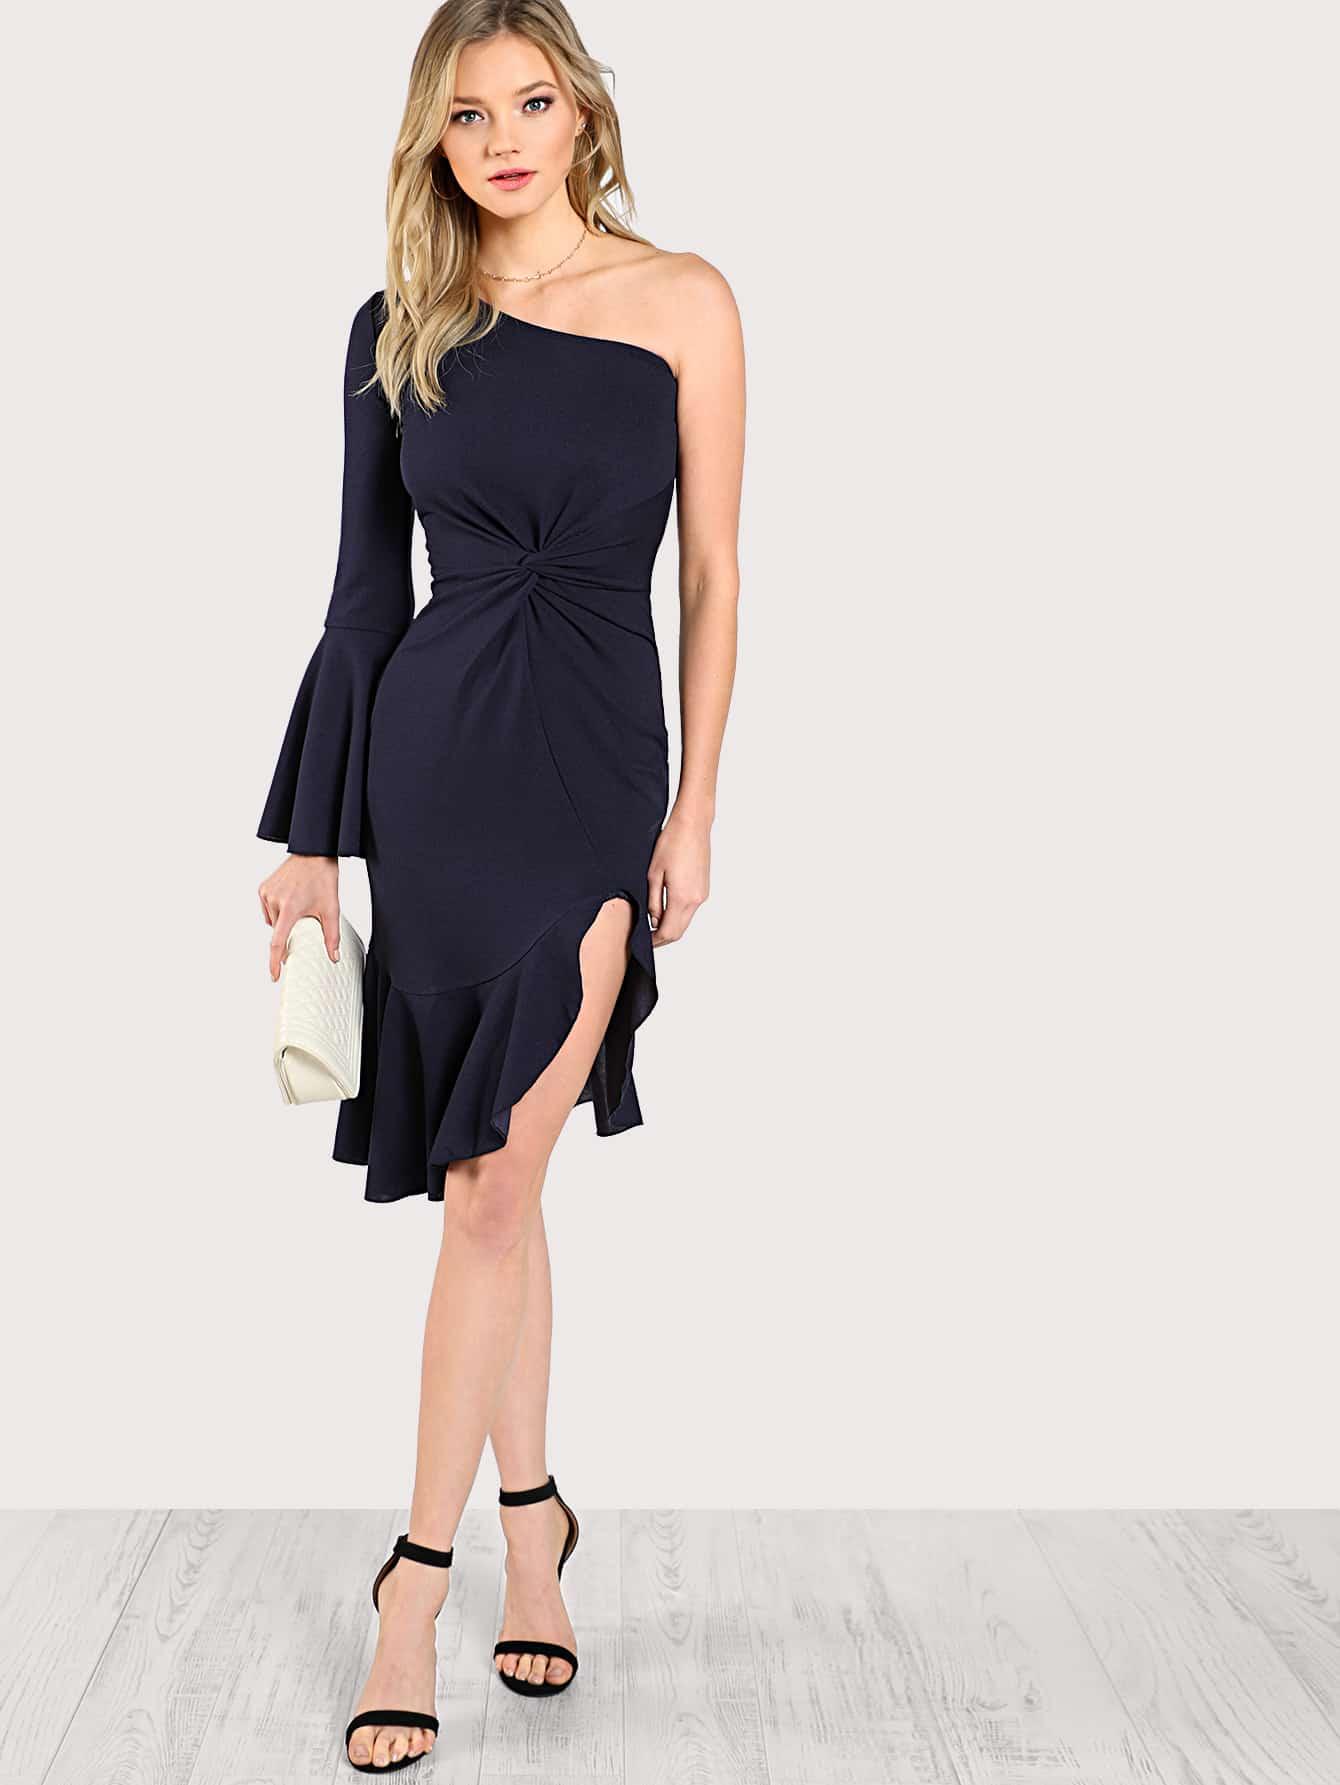 One Shoulder Twist Front Slit Ruffle Hem Dress wrap front tied v back ruffle hem dress